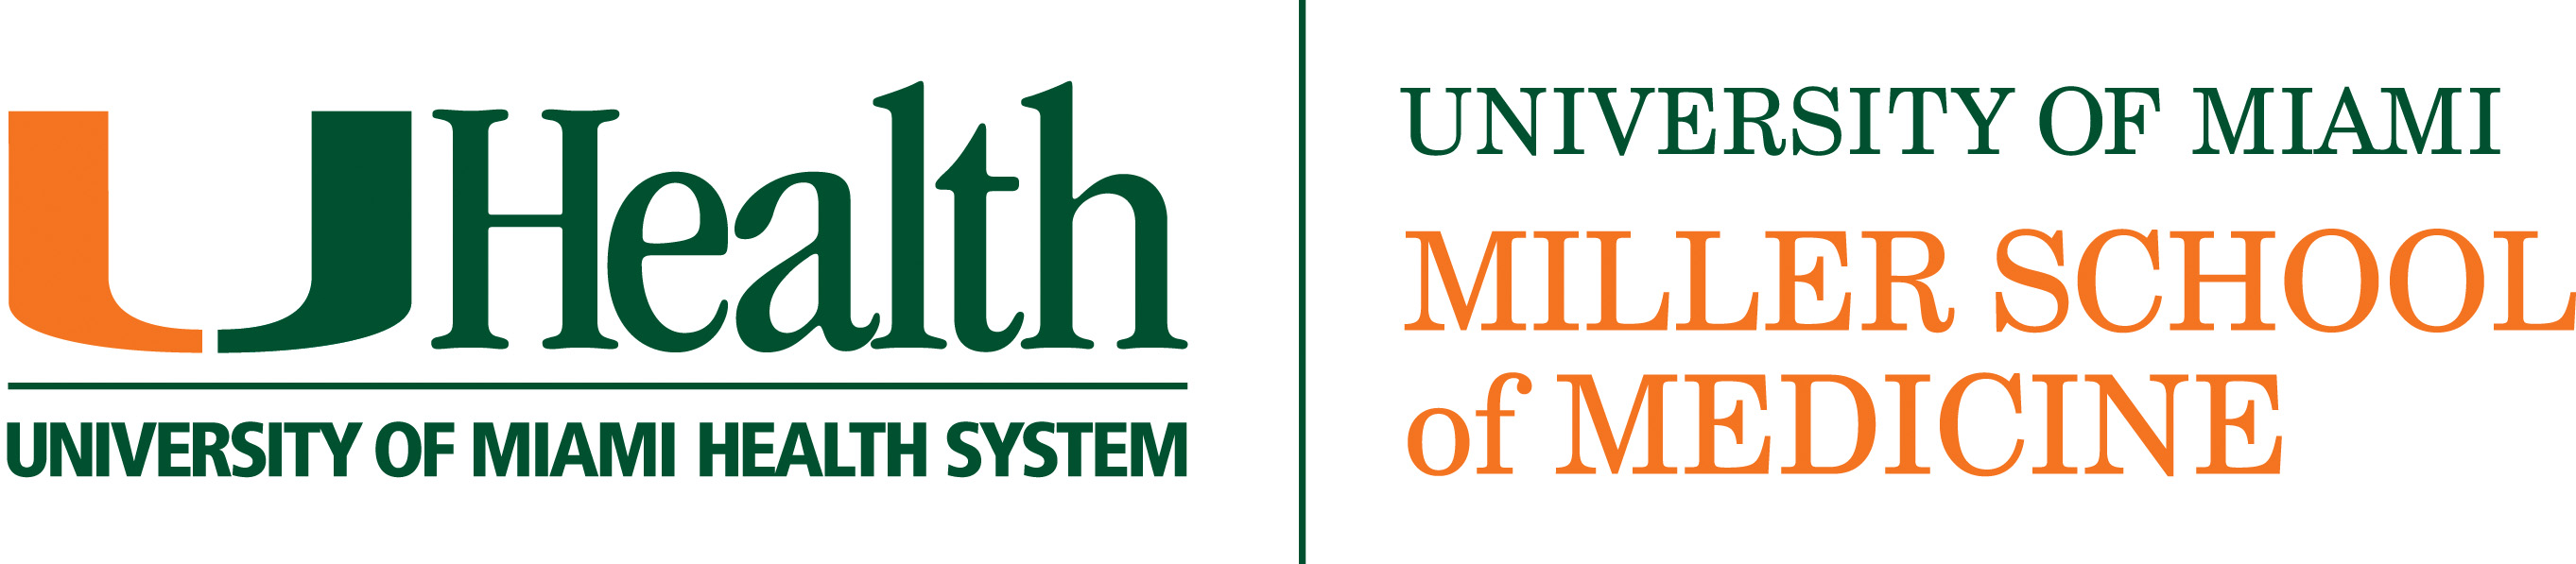 University of miami Logos With Regard To University Of Miami Powerpoint Template